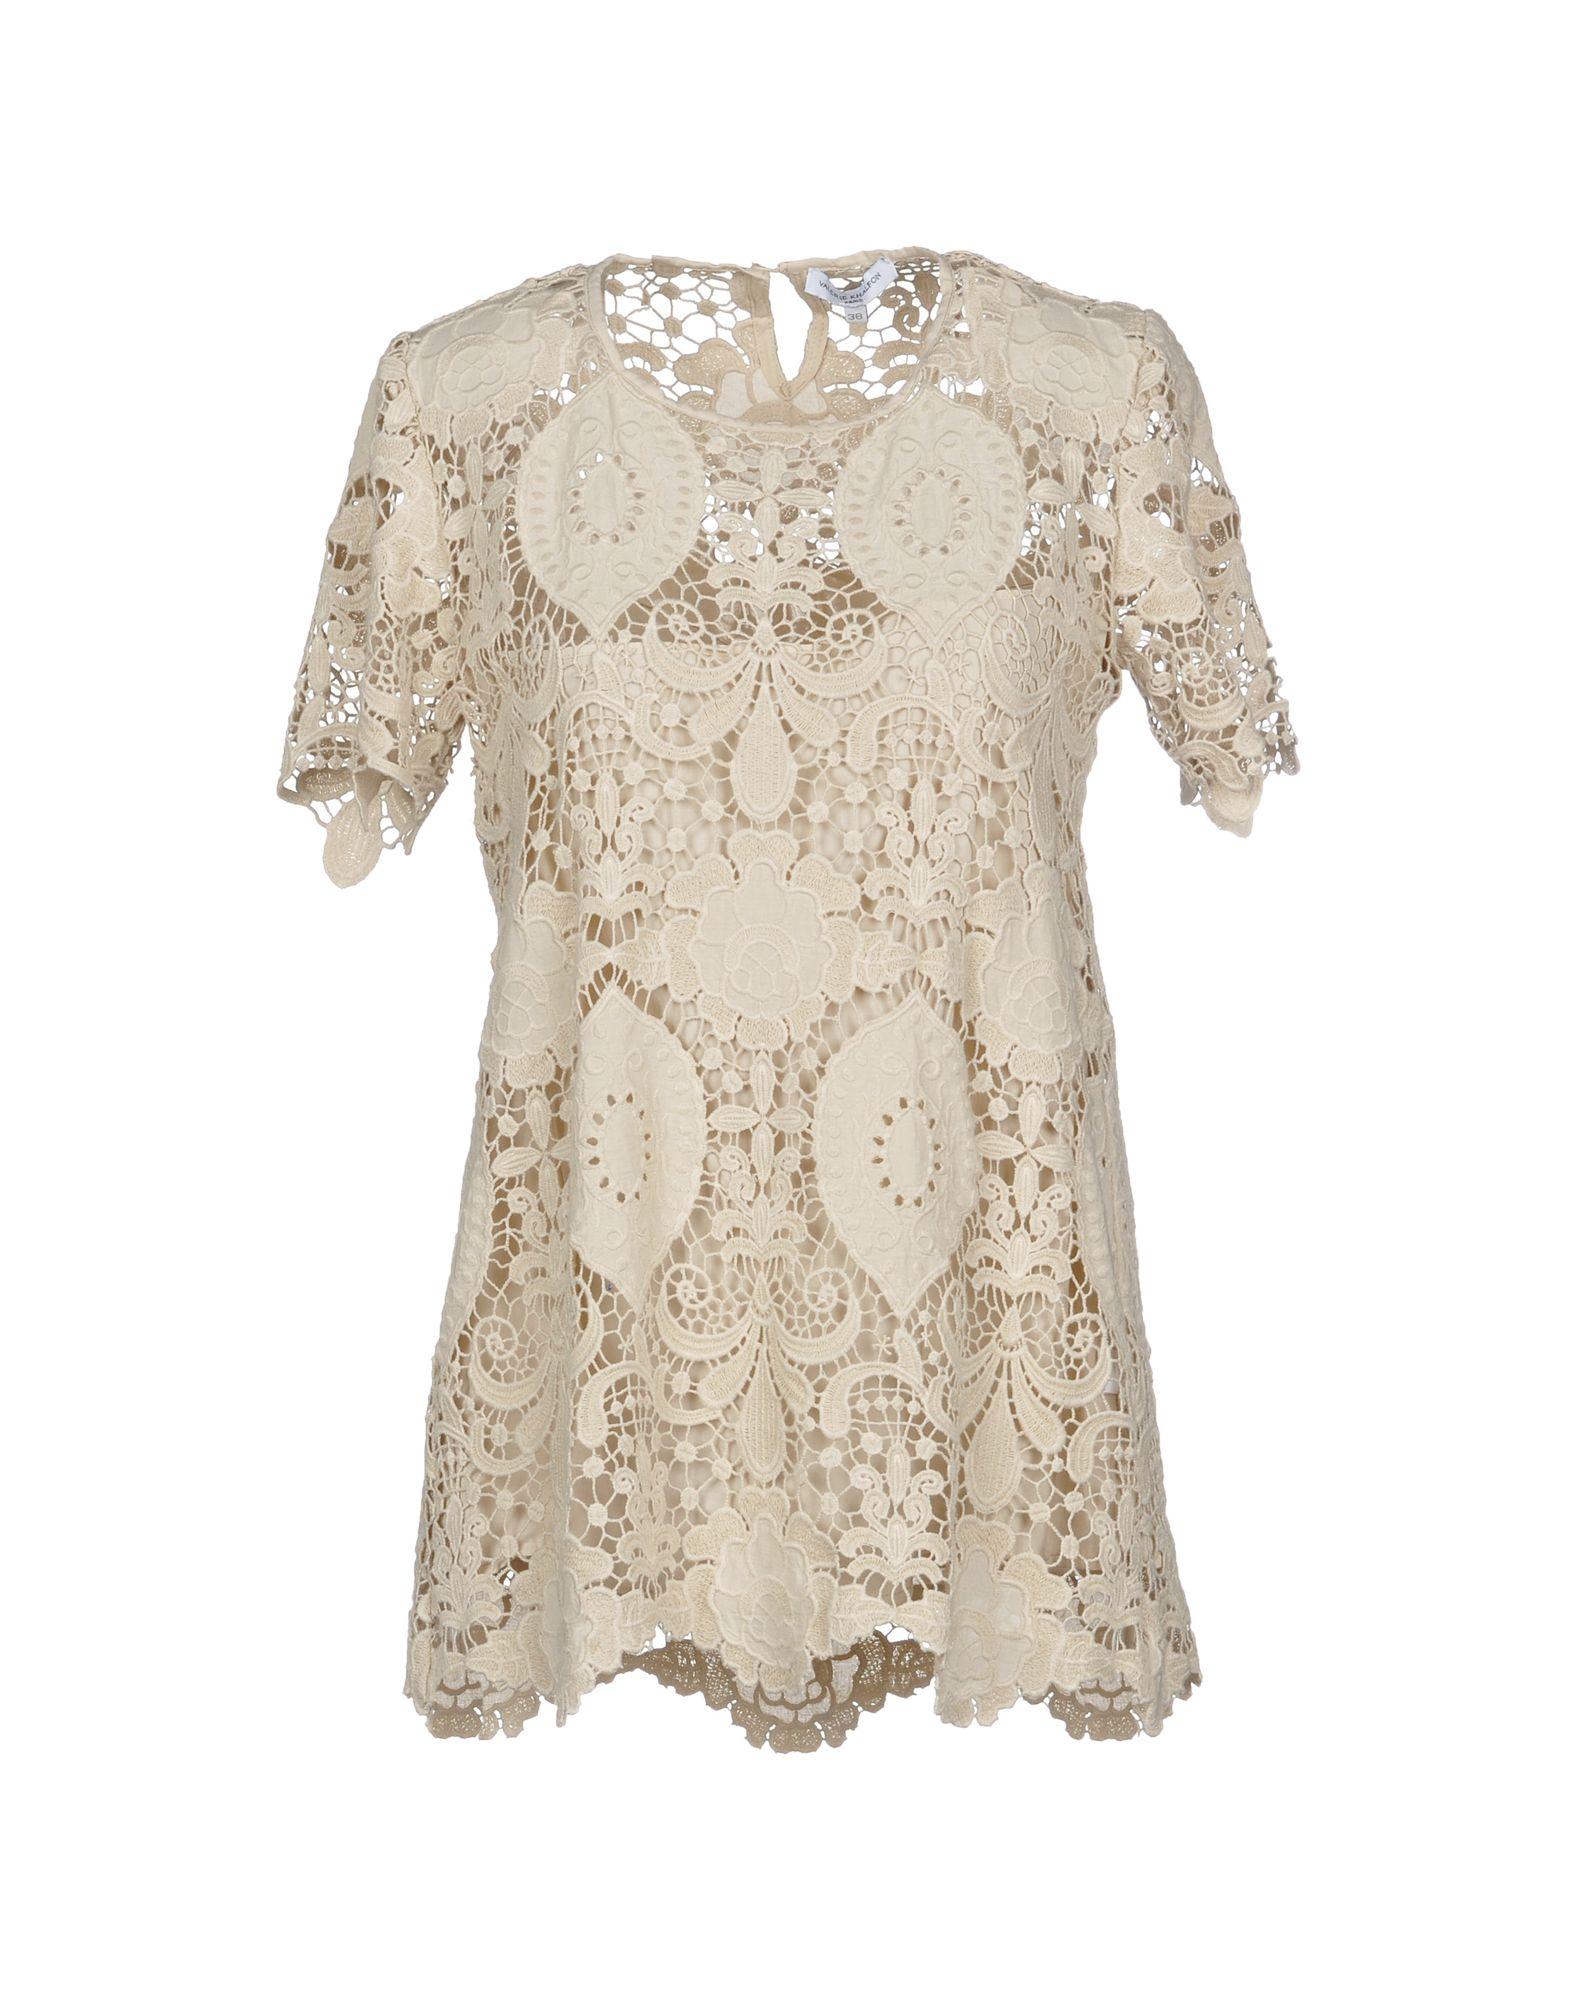 Fashion since 1900 valerie mendes 87